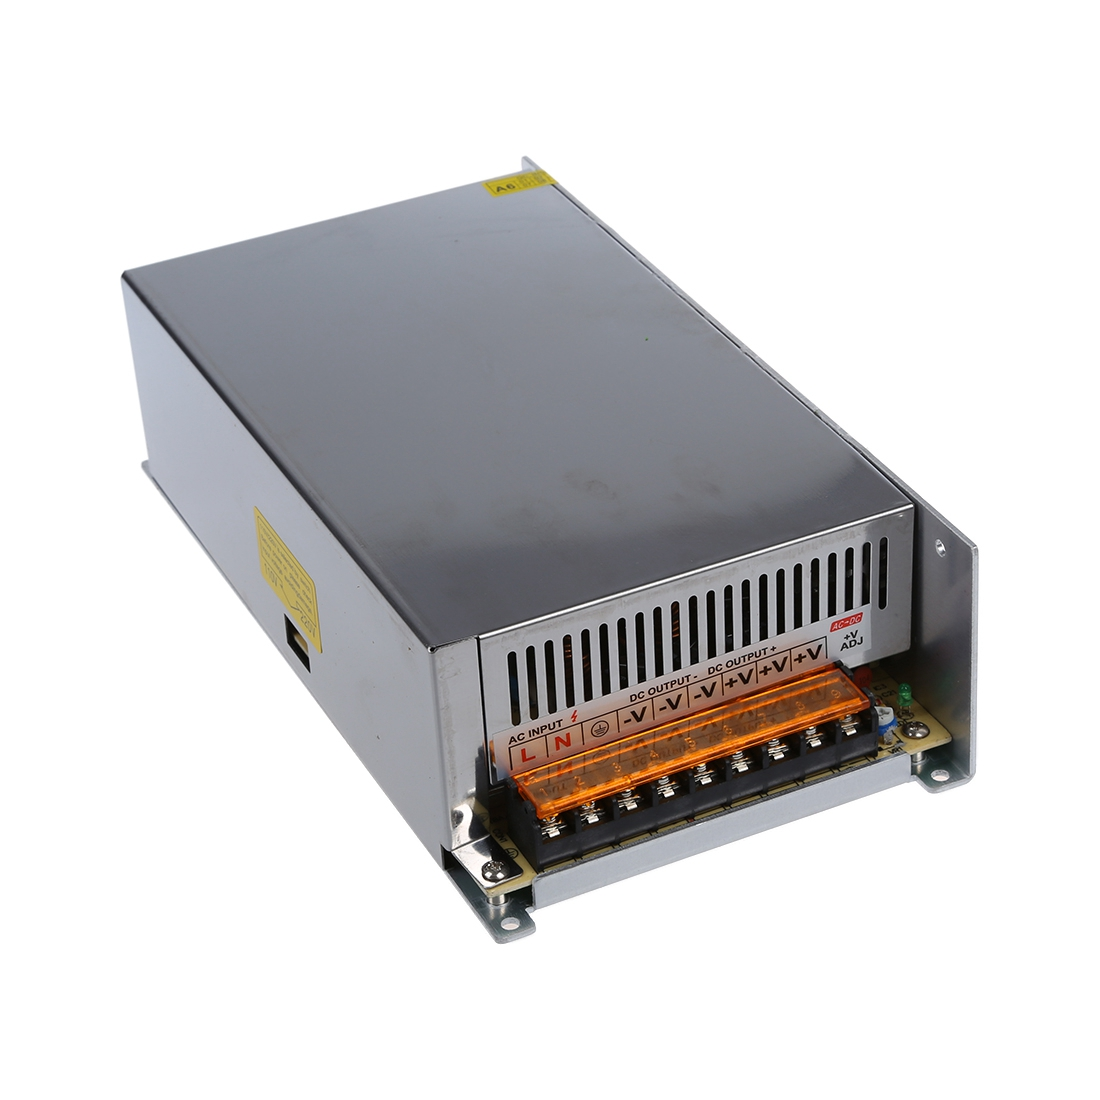 DC 12V 50A 600W Switching Power Supply Transformer for LED Strip Light 110/220V DropshippingDC 12V 50A 600W Switching Power Supply Transformer for LED Strip Light 110/220V Dropshipping